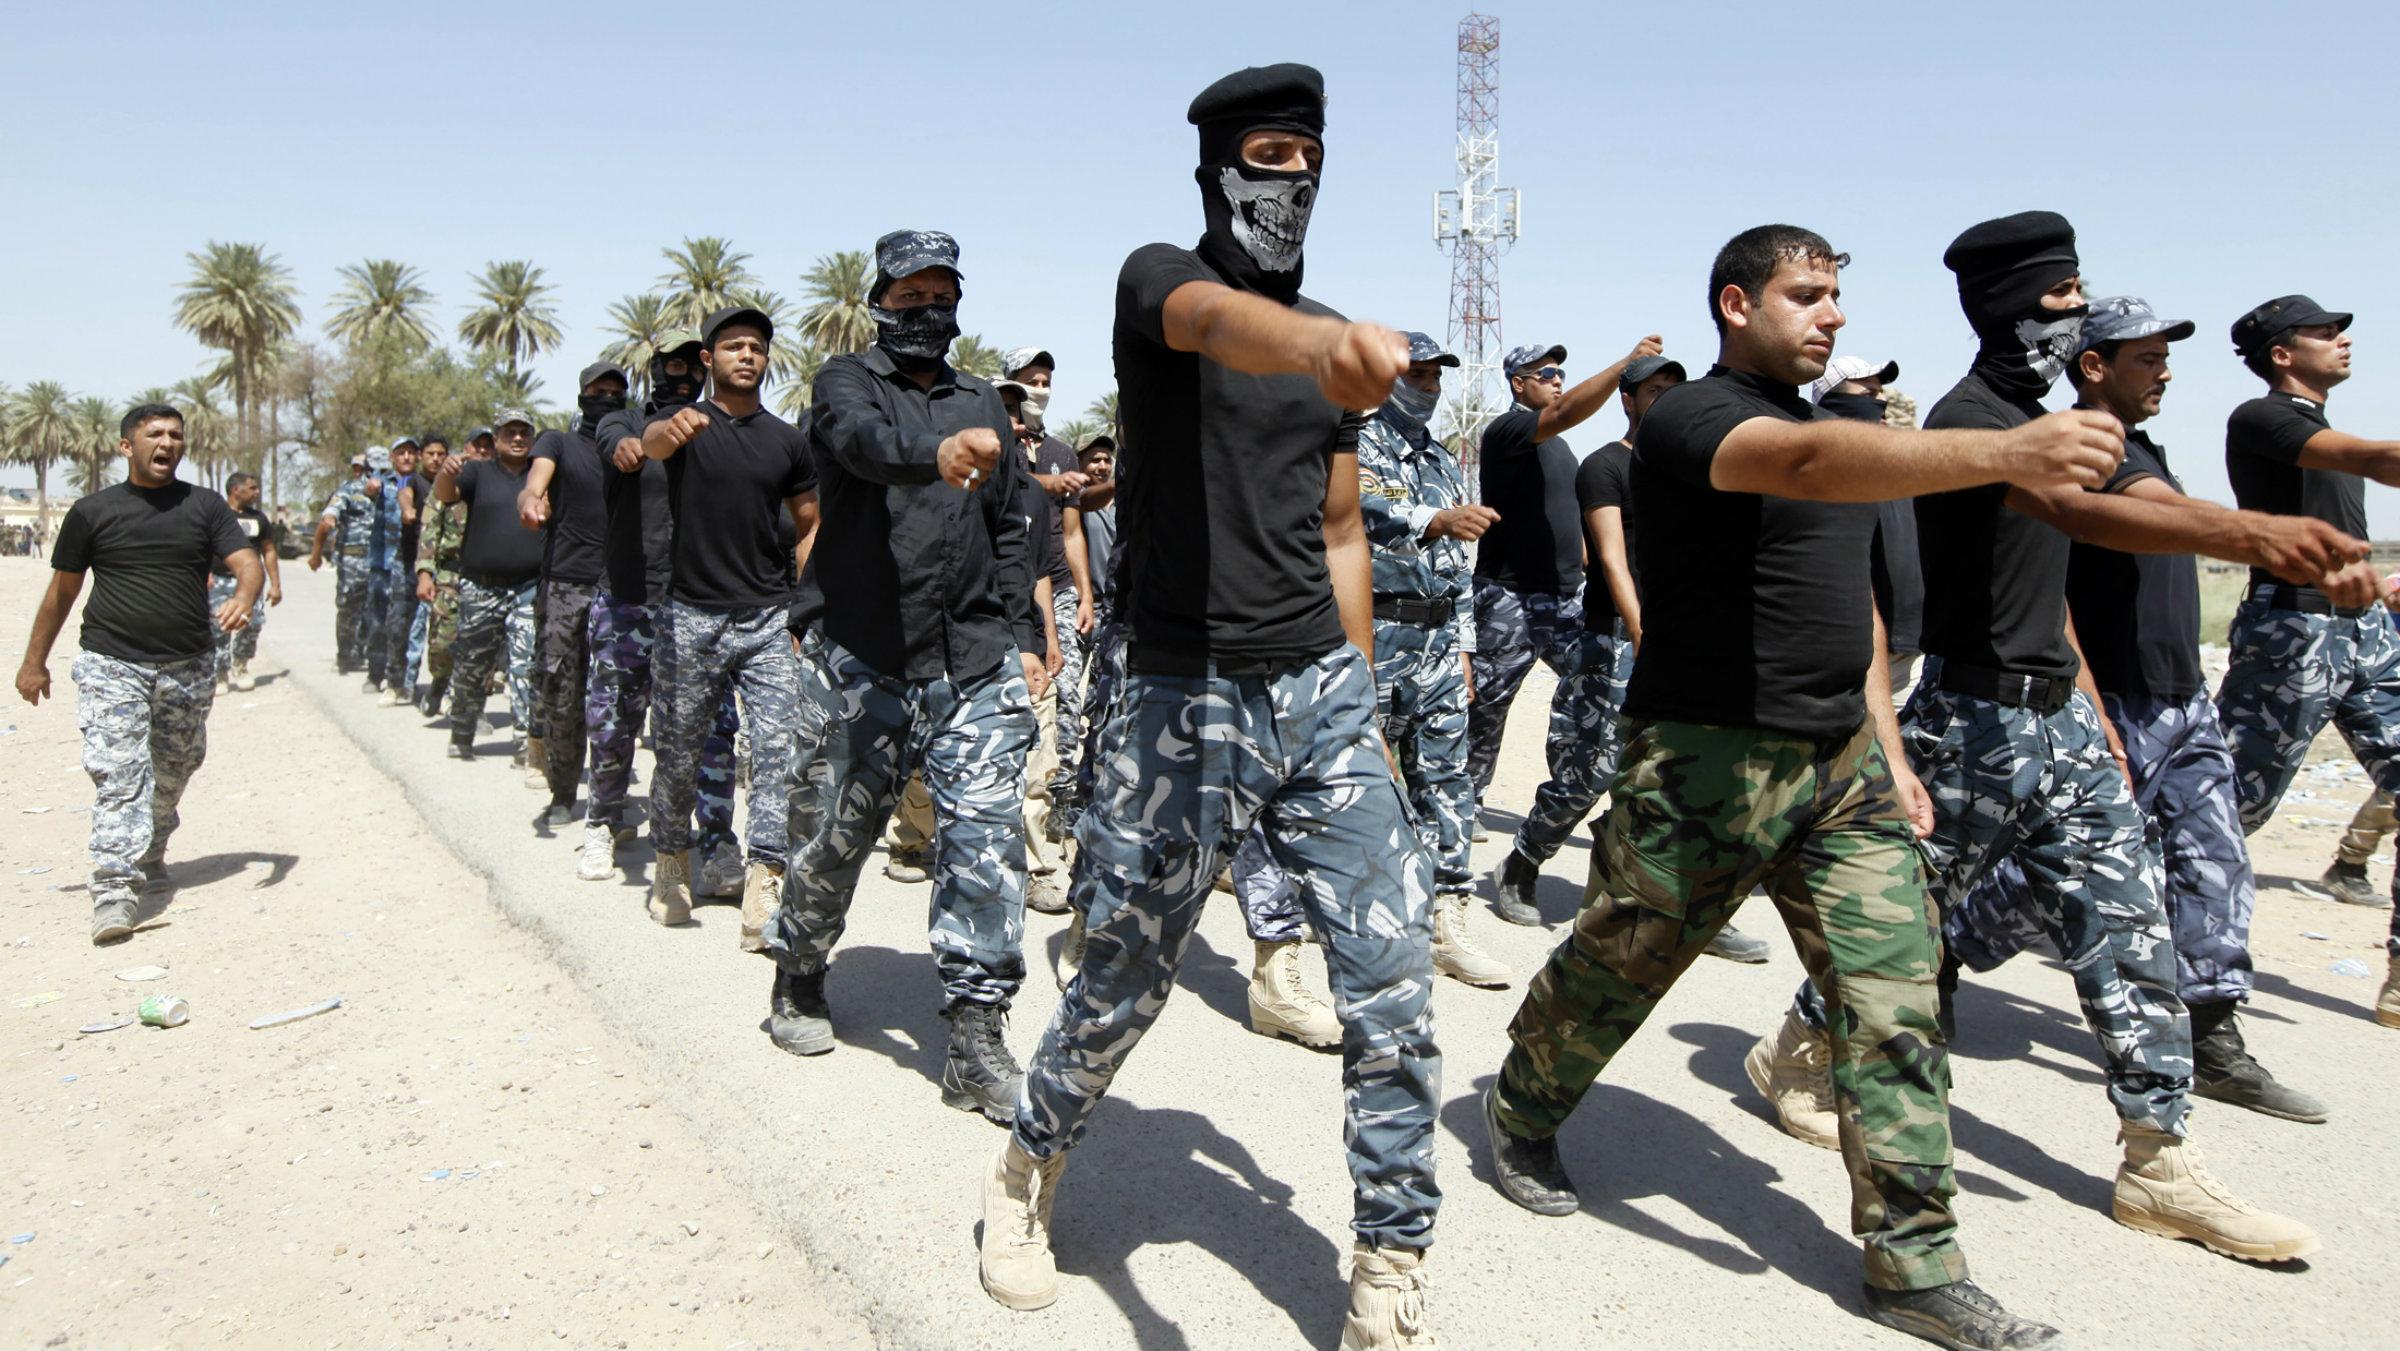 Shi'ite volunteers training in Baghdad on July 9, 2014.